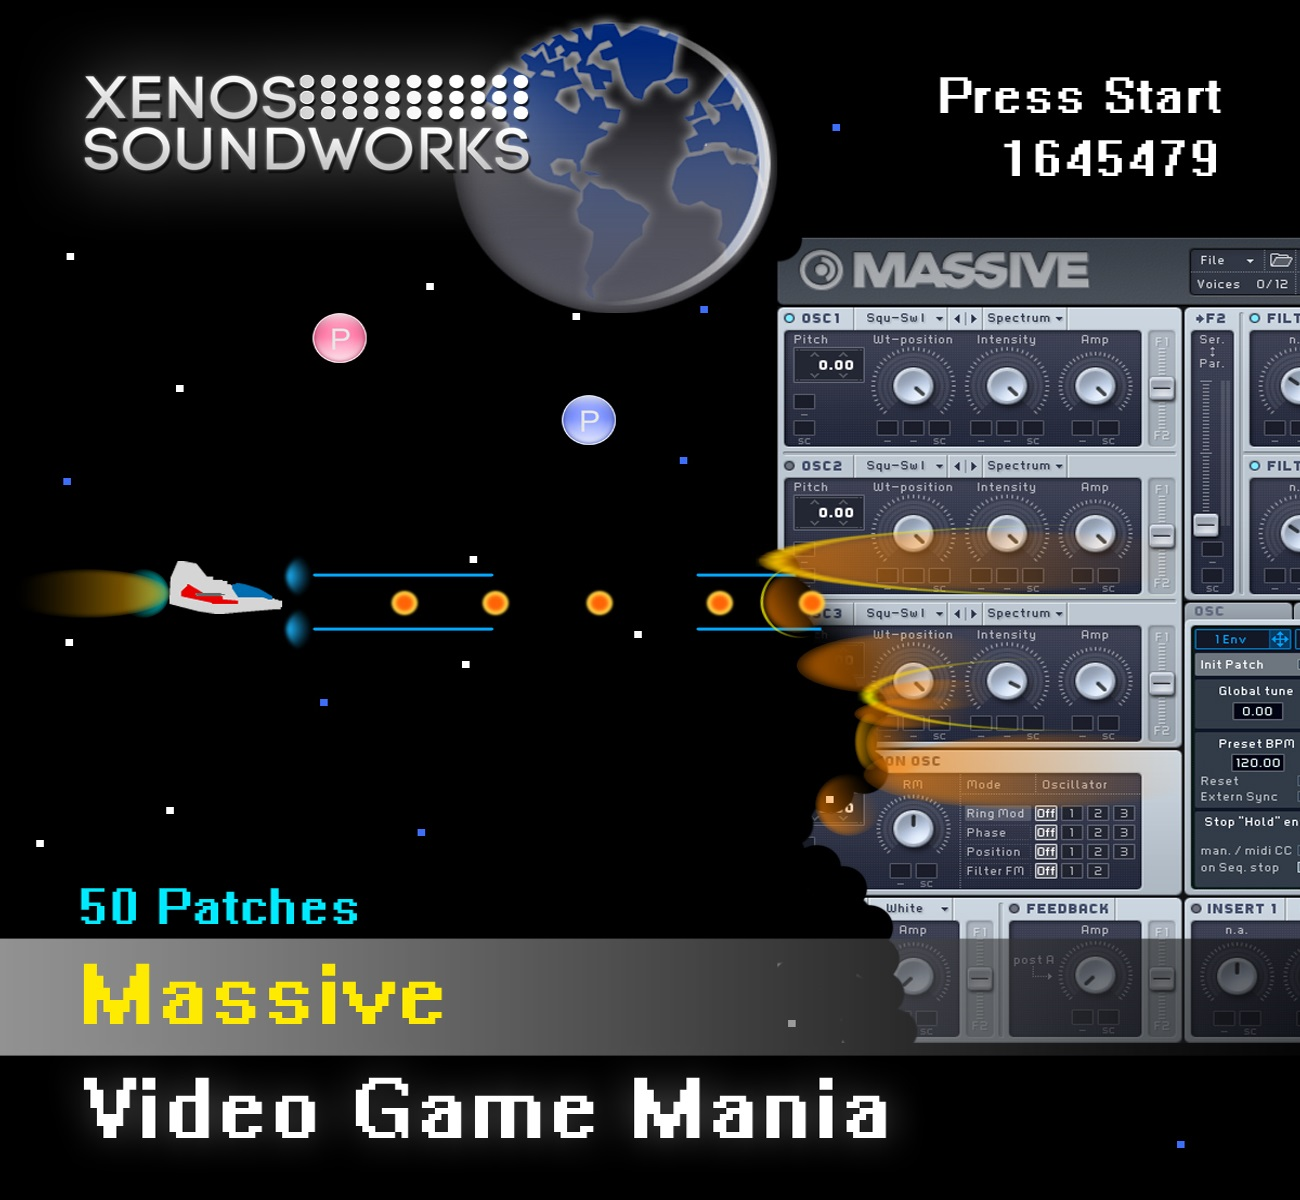 Videogame Mania for N.I. Massive